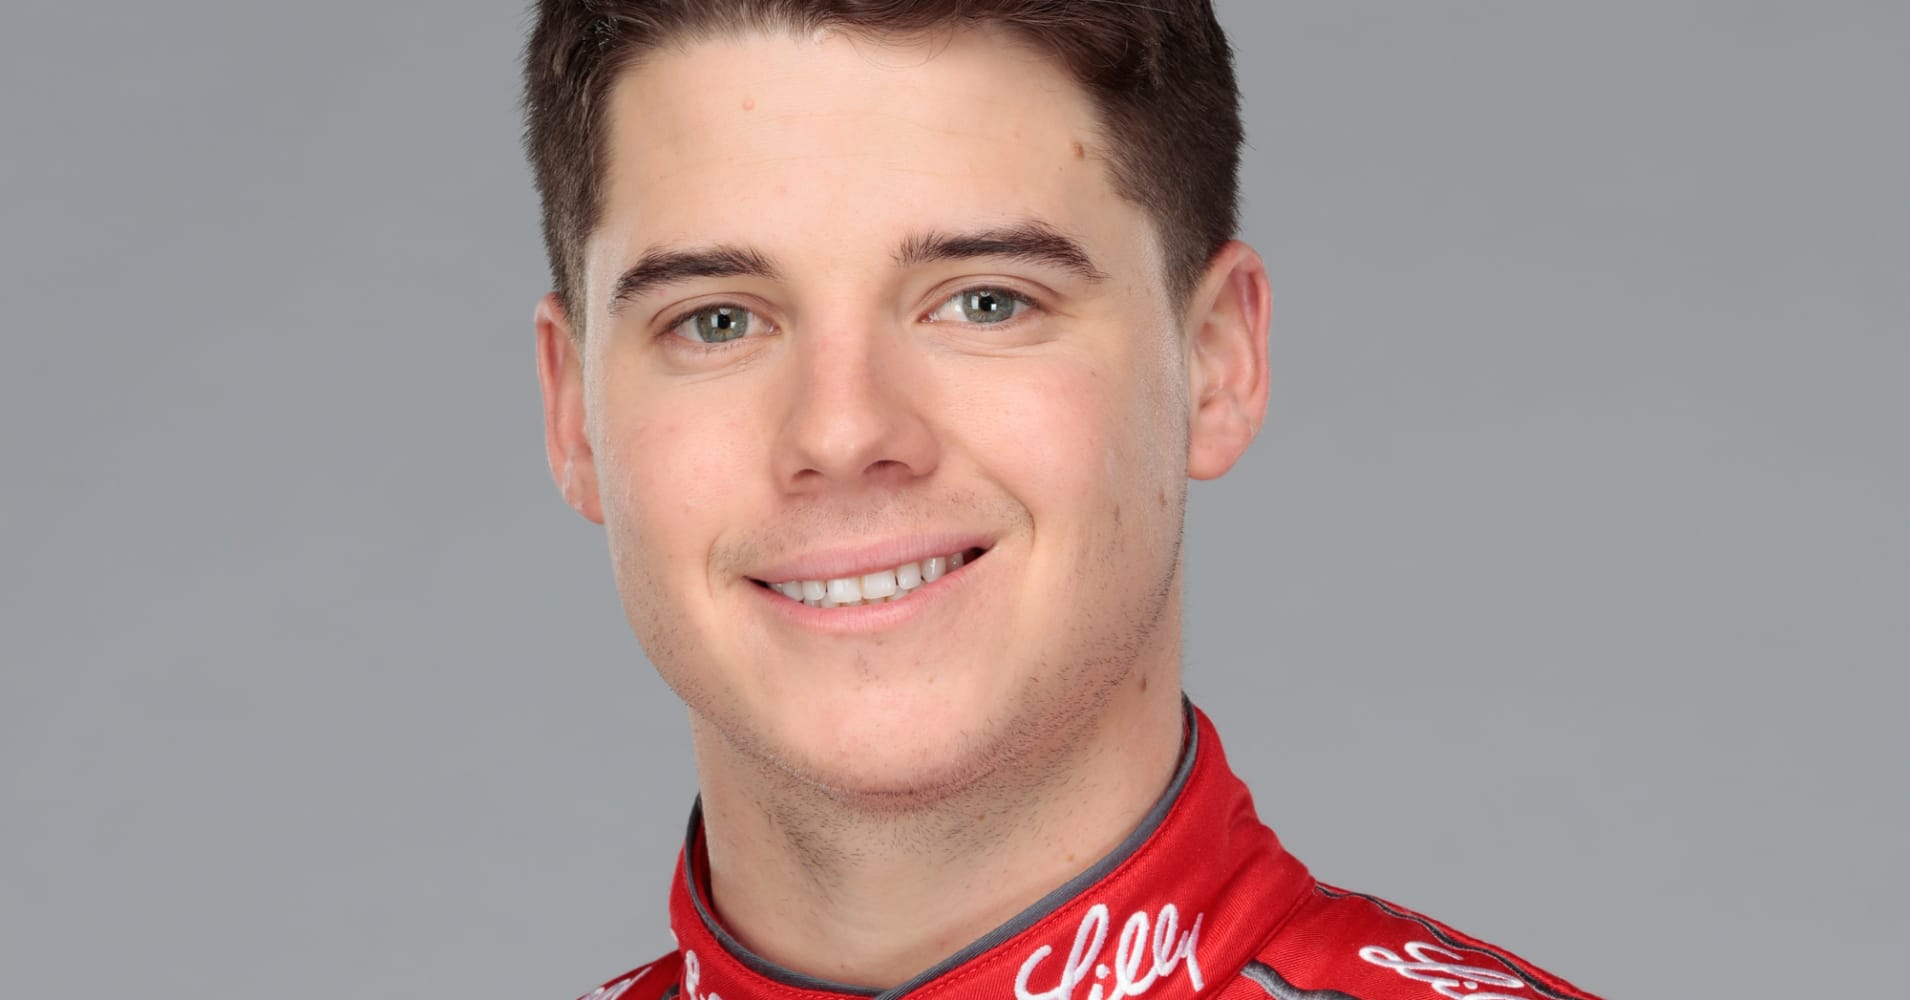 NASCAR driver Ryan Reed